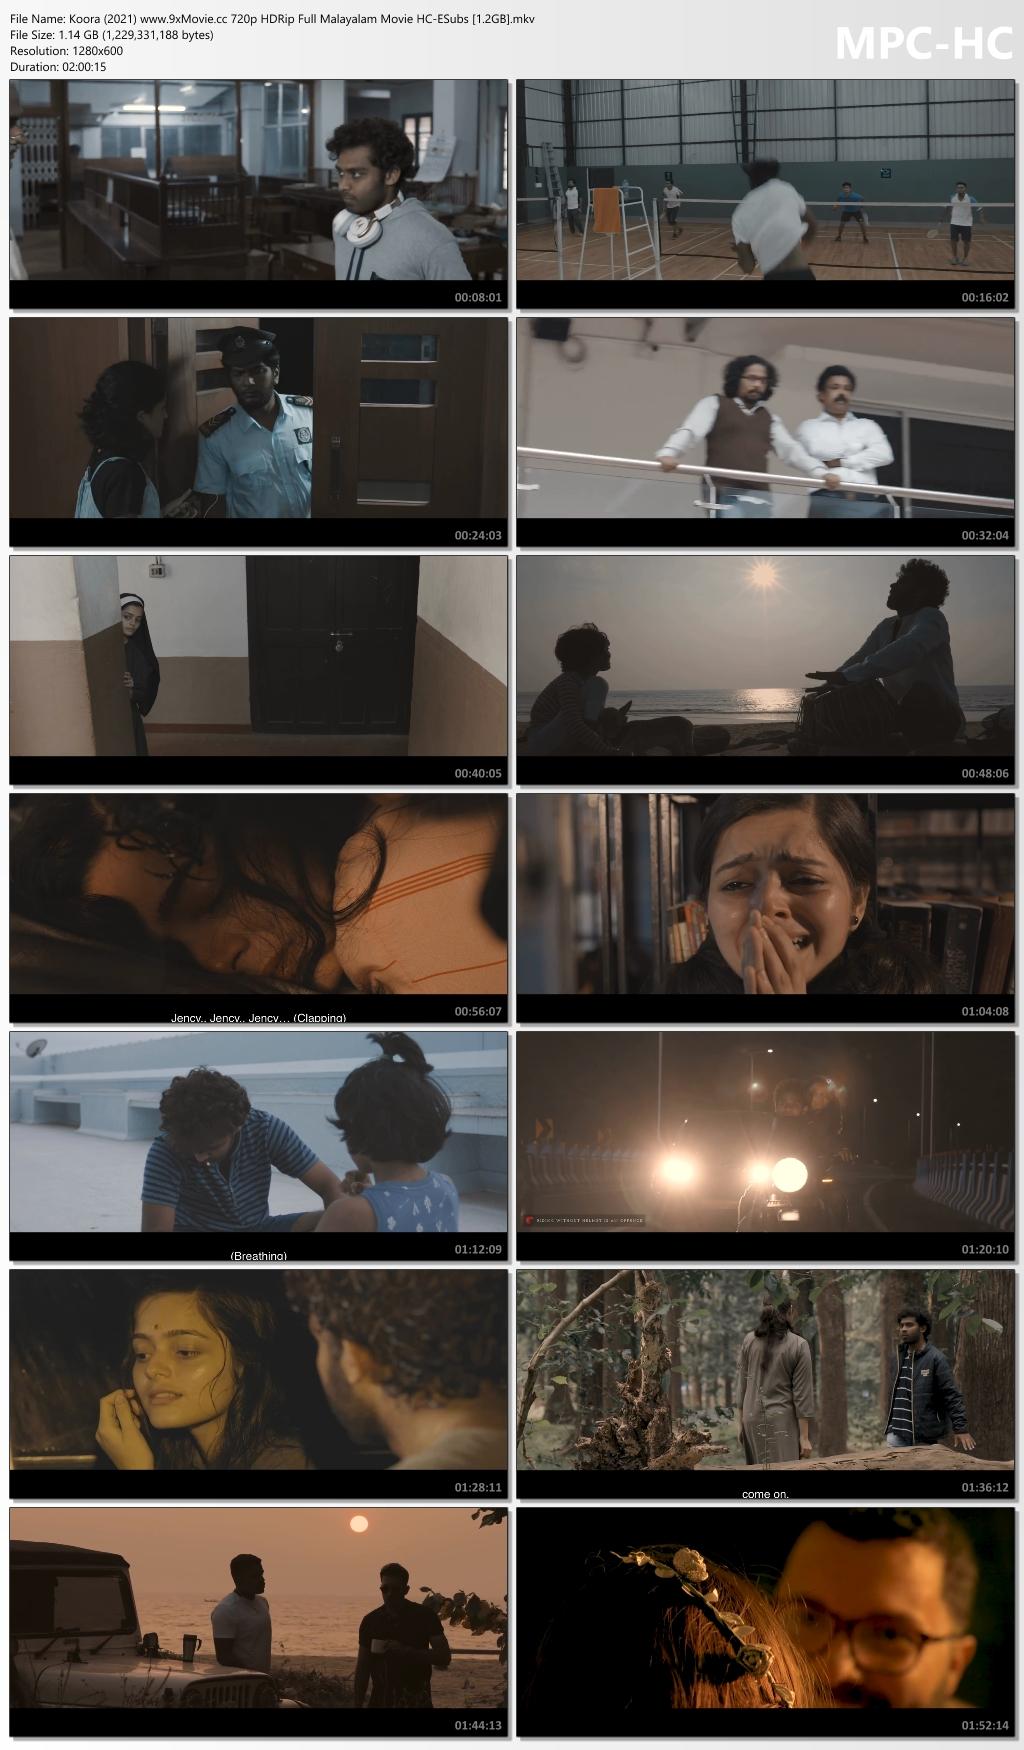 Koora-2021-www-9x-Movie-cc-720p-HDRip-Full-Malayalam-Movie-HC-ESubs-1-2-GB-mkv